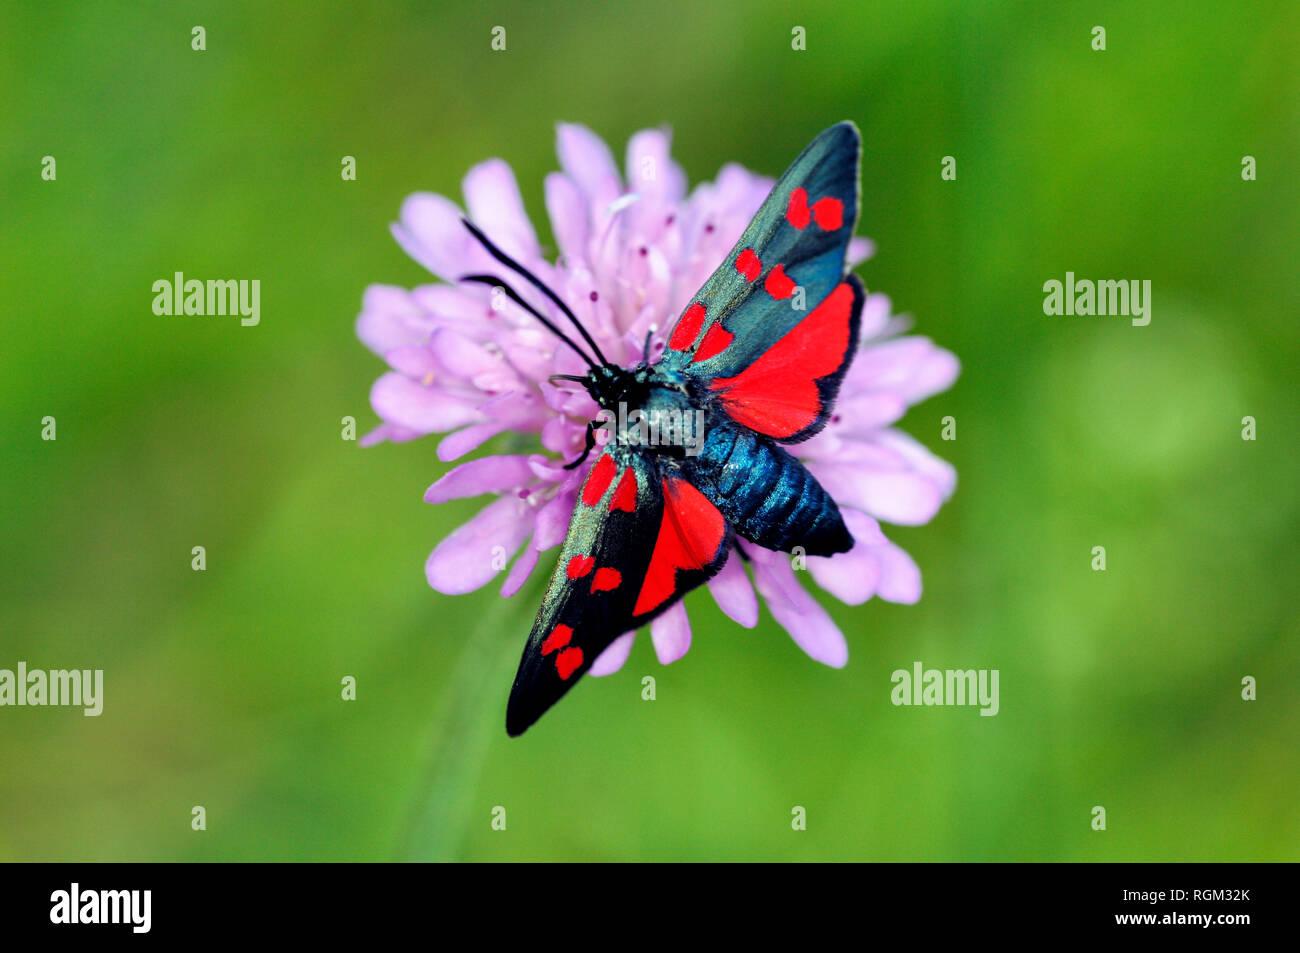 Six-spot Burnet Moth, Zygaena filipendulae, une espèce d'Day-Flying Banque D'Images